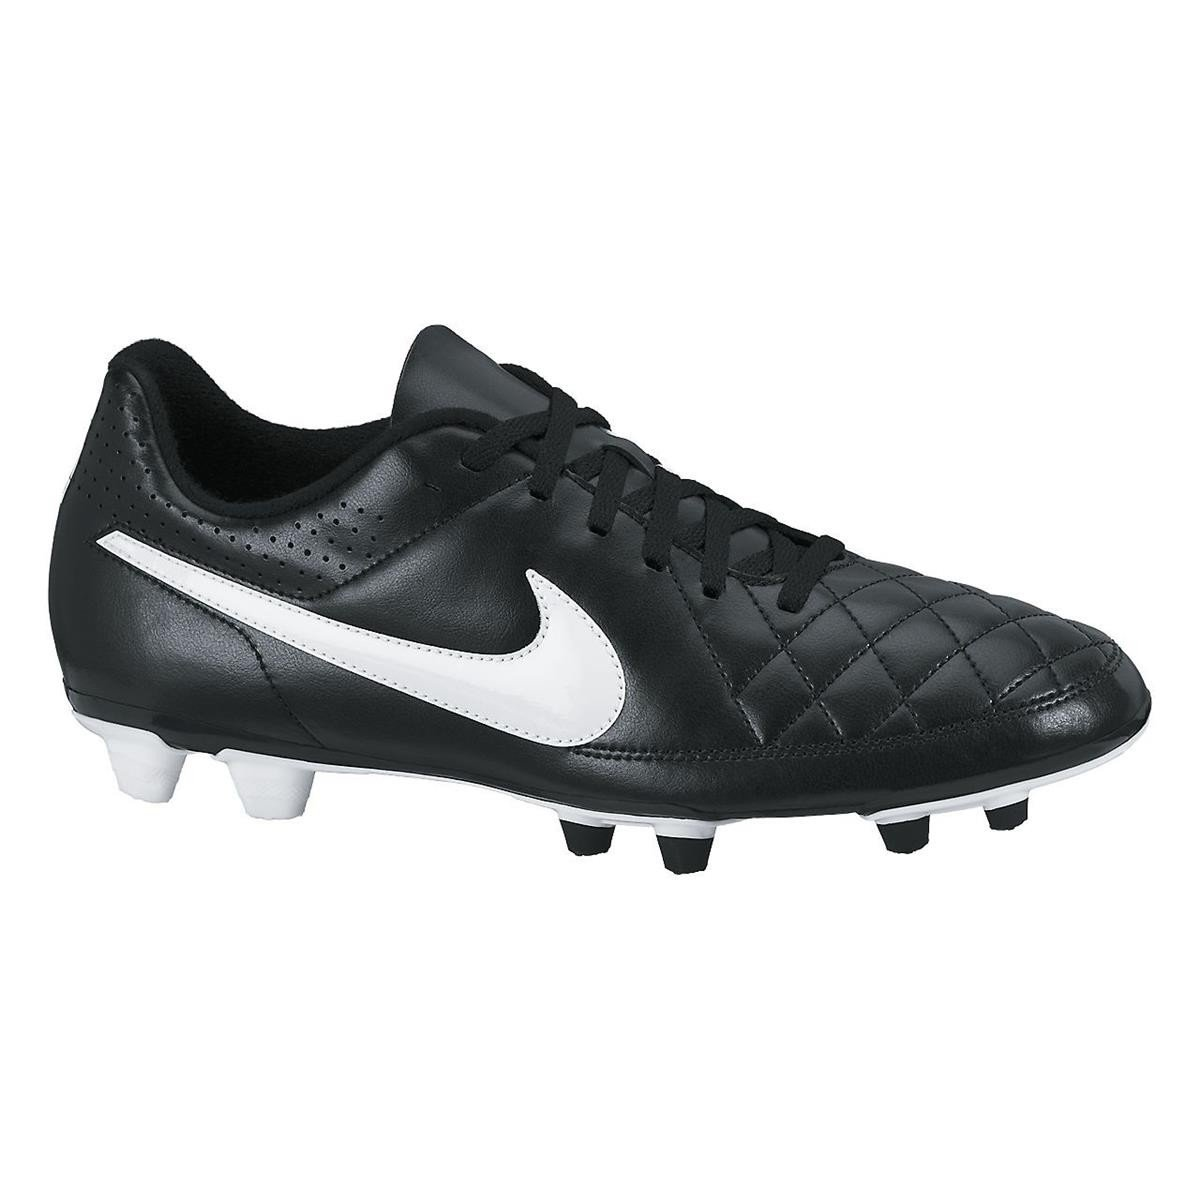 a68ea7df2cf Nike Tiempo Rio Ii Fg Men s Football Boots Black Size  15 UK  Amazon.co.uk   Shoes   Bags